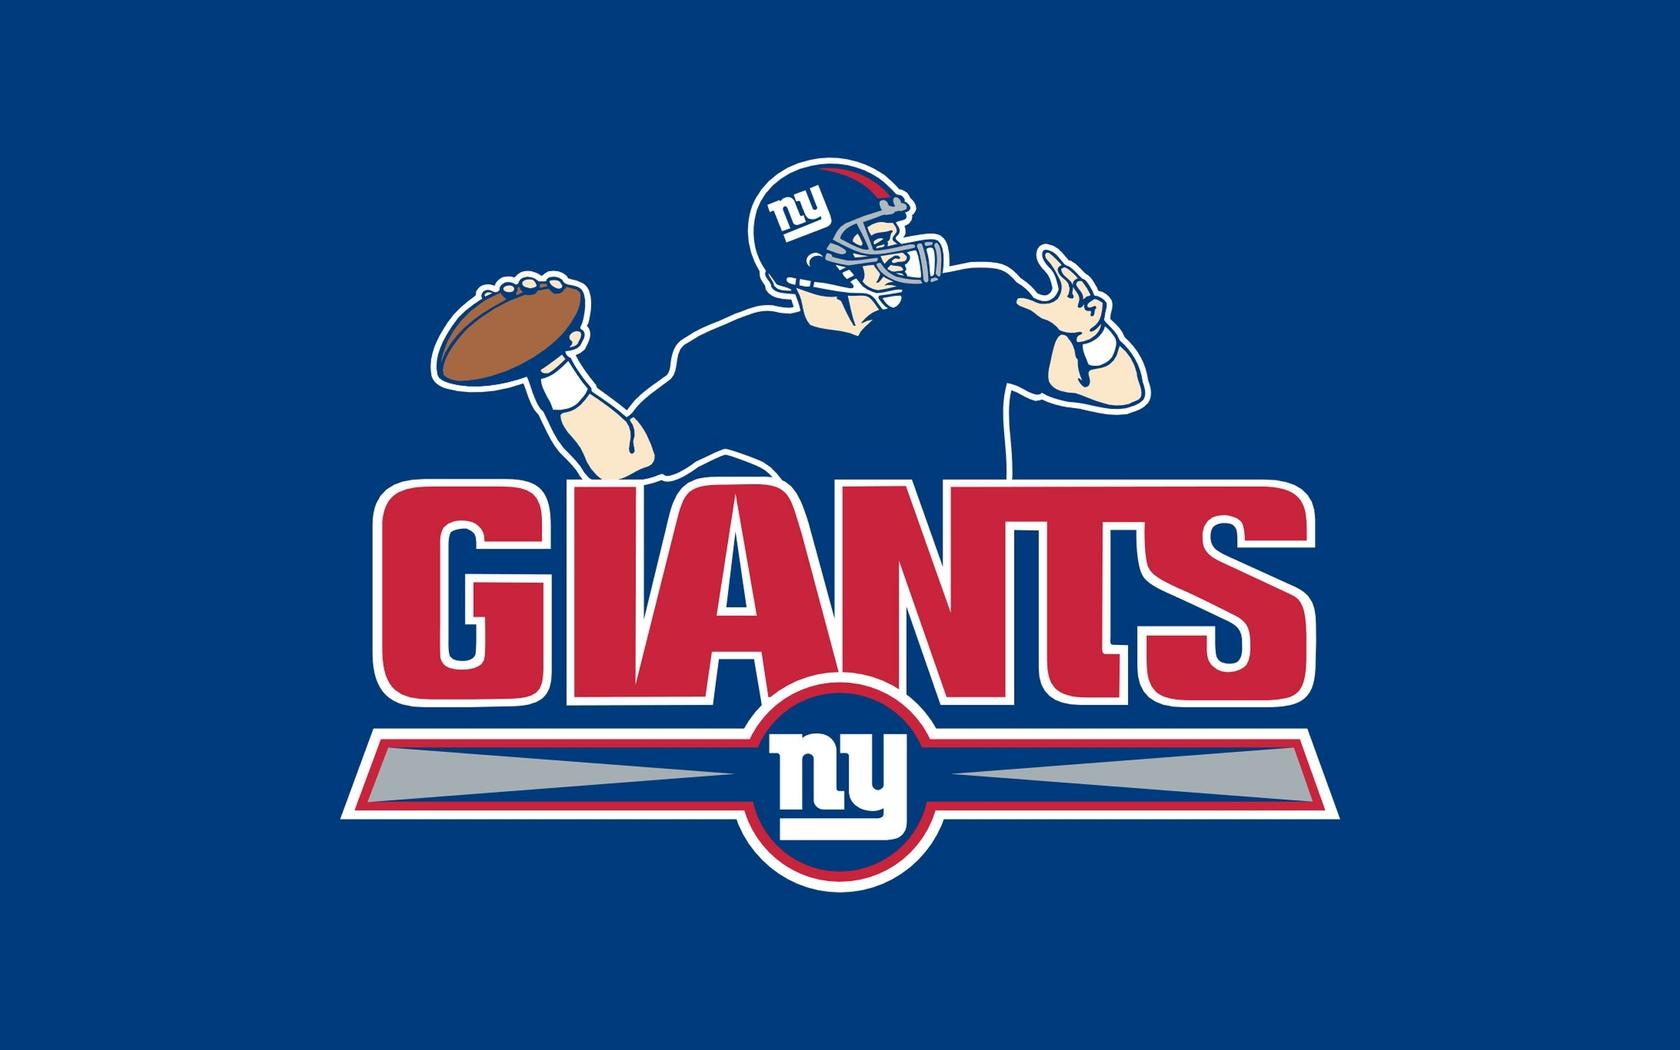 New York Giants Logo Wallpaper - WallpaperSafari